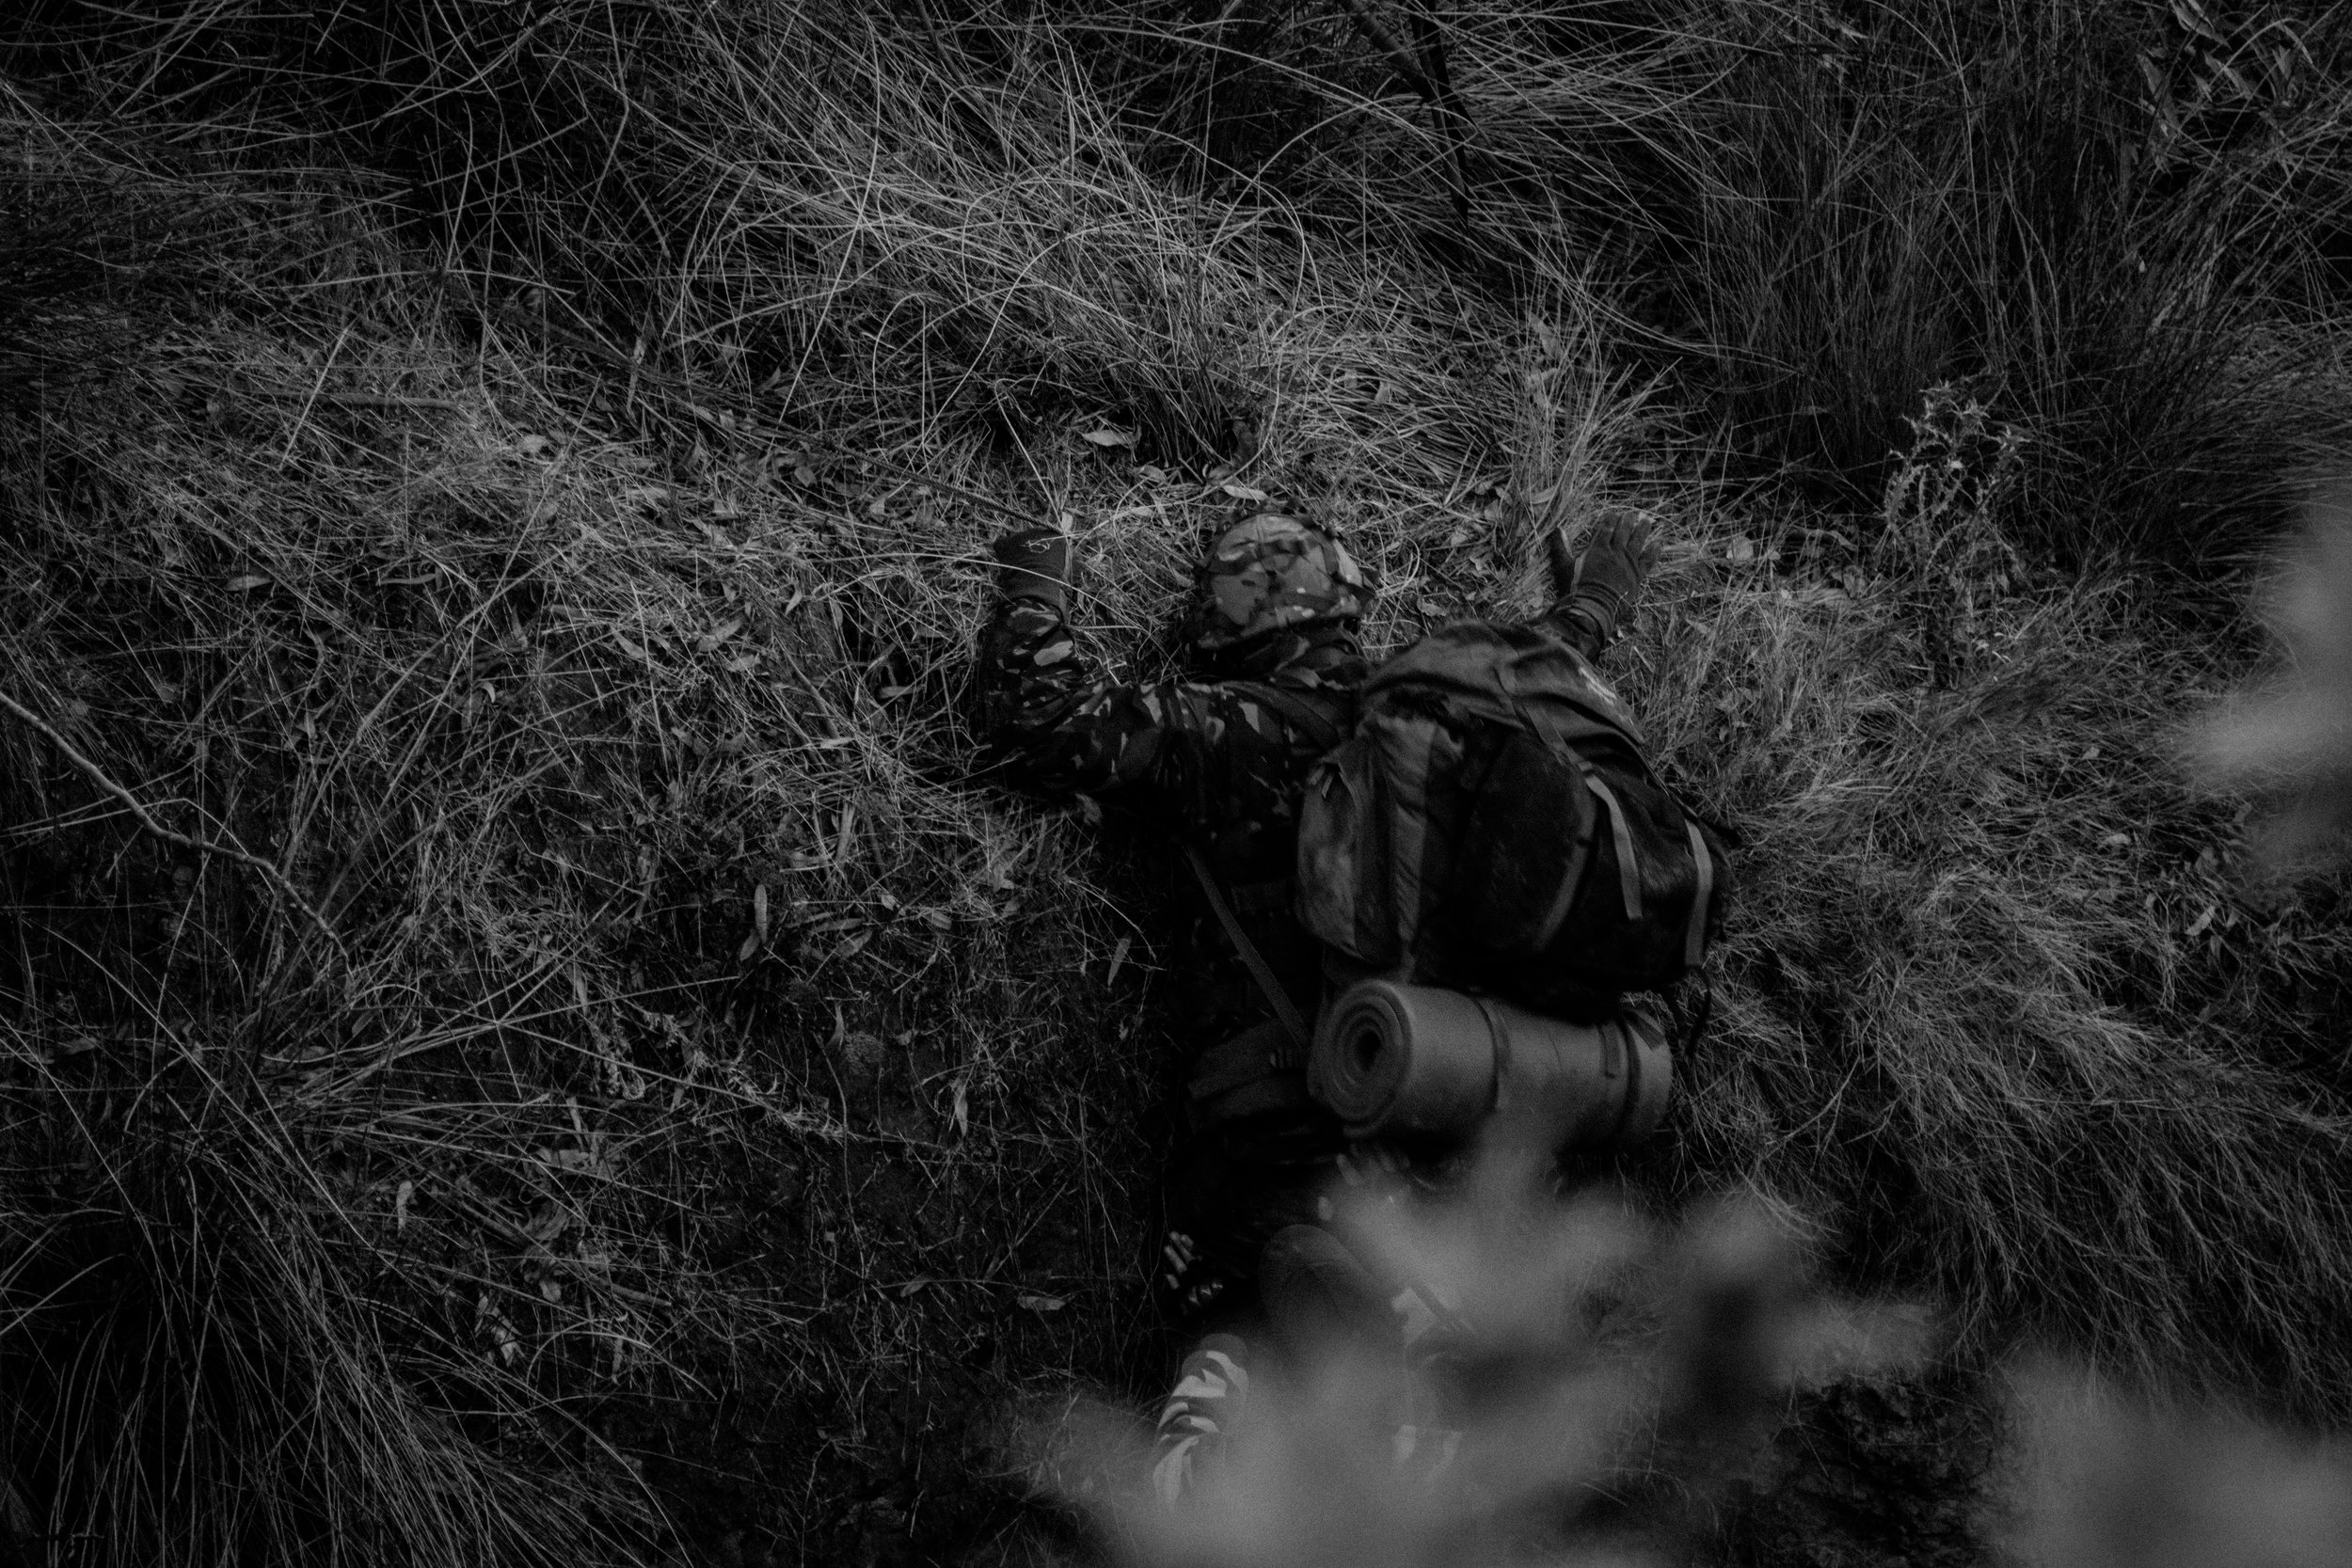 doug, a journalist, is climbing up the ravine